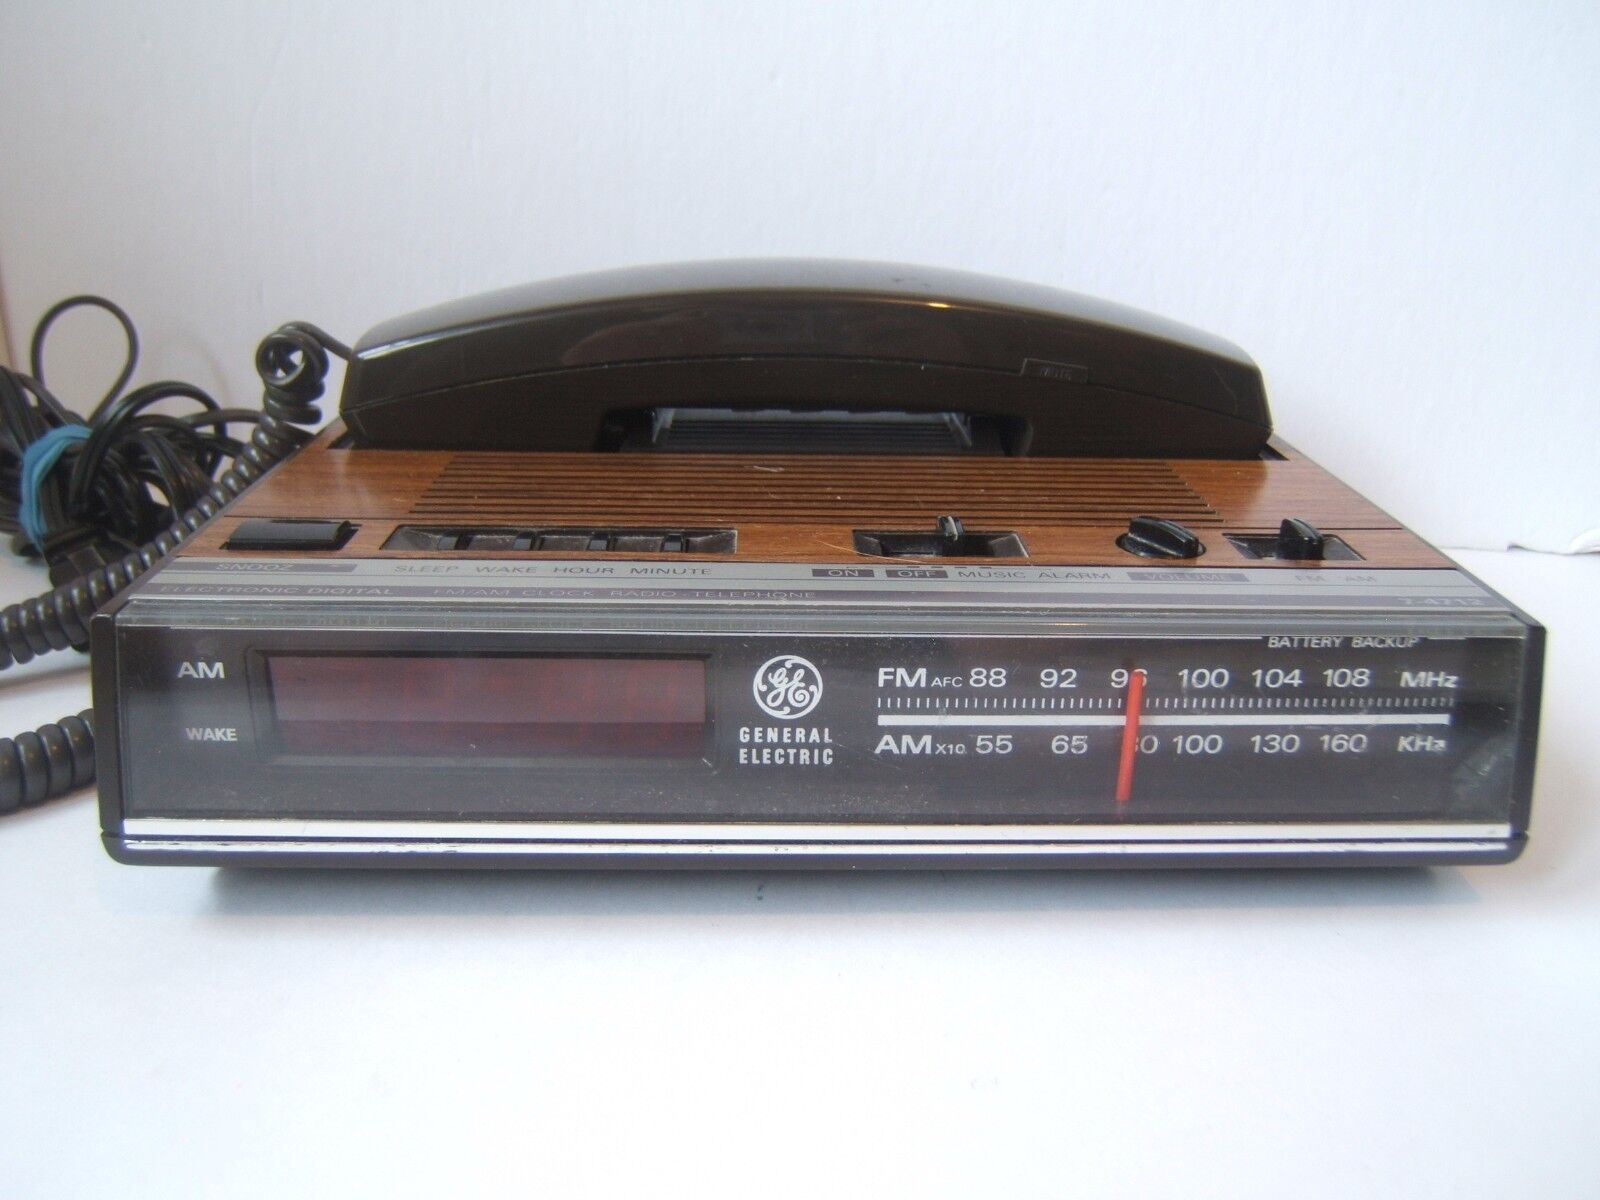 Vintage General Electric Clock Radio Telephone Woodgrain Finish Tested Works